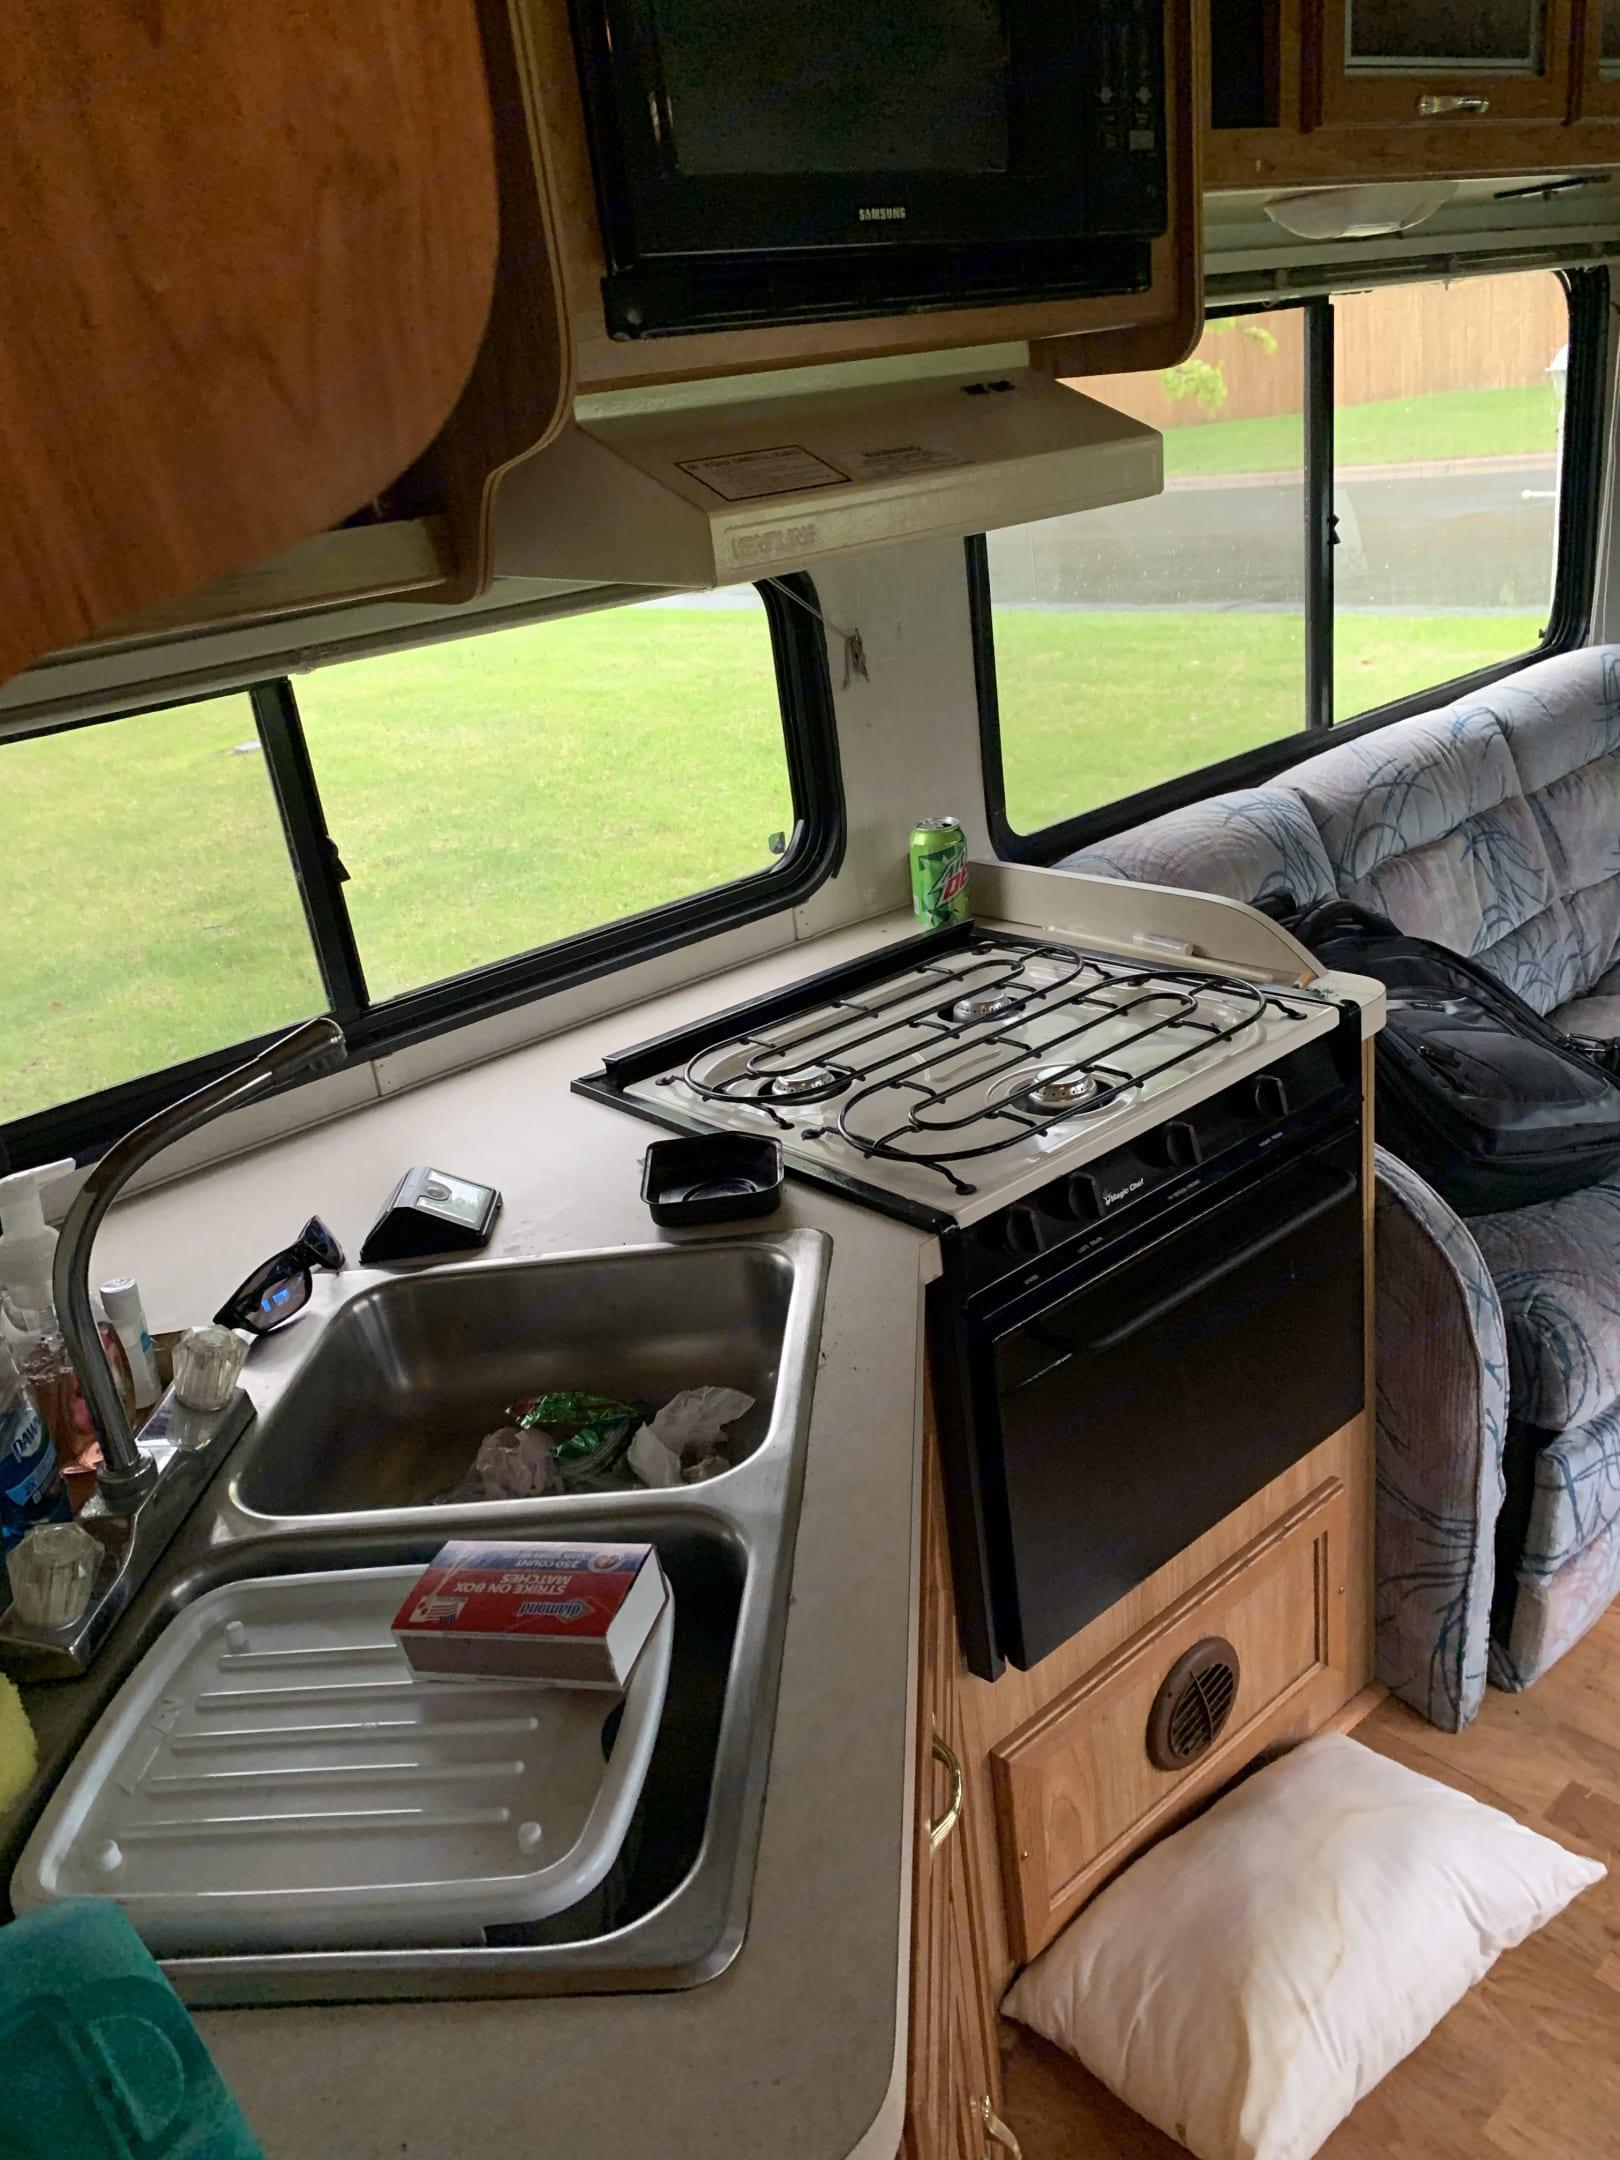 Kitchen area (stove oven and sink work). Coachmen Pathfinder 2001